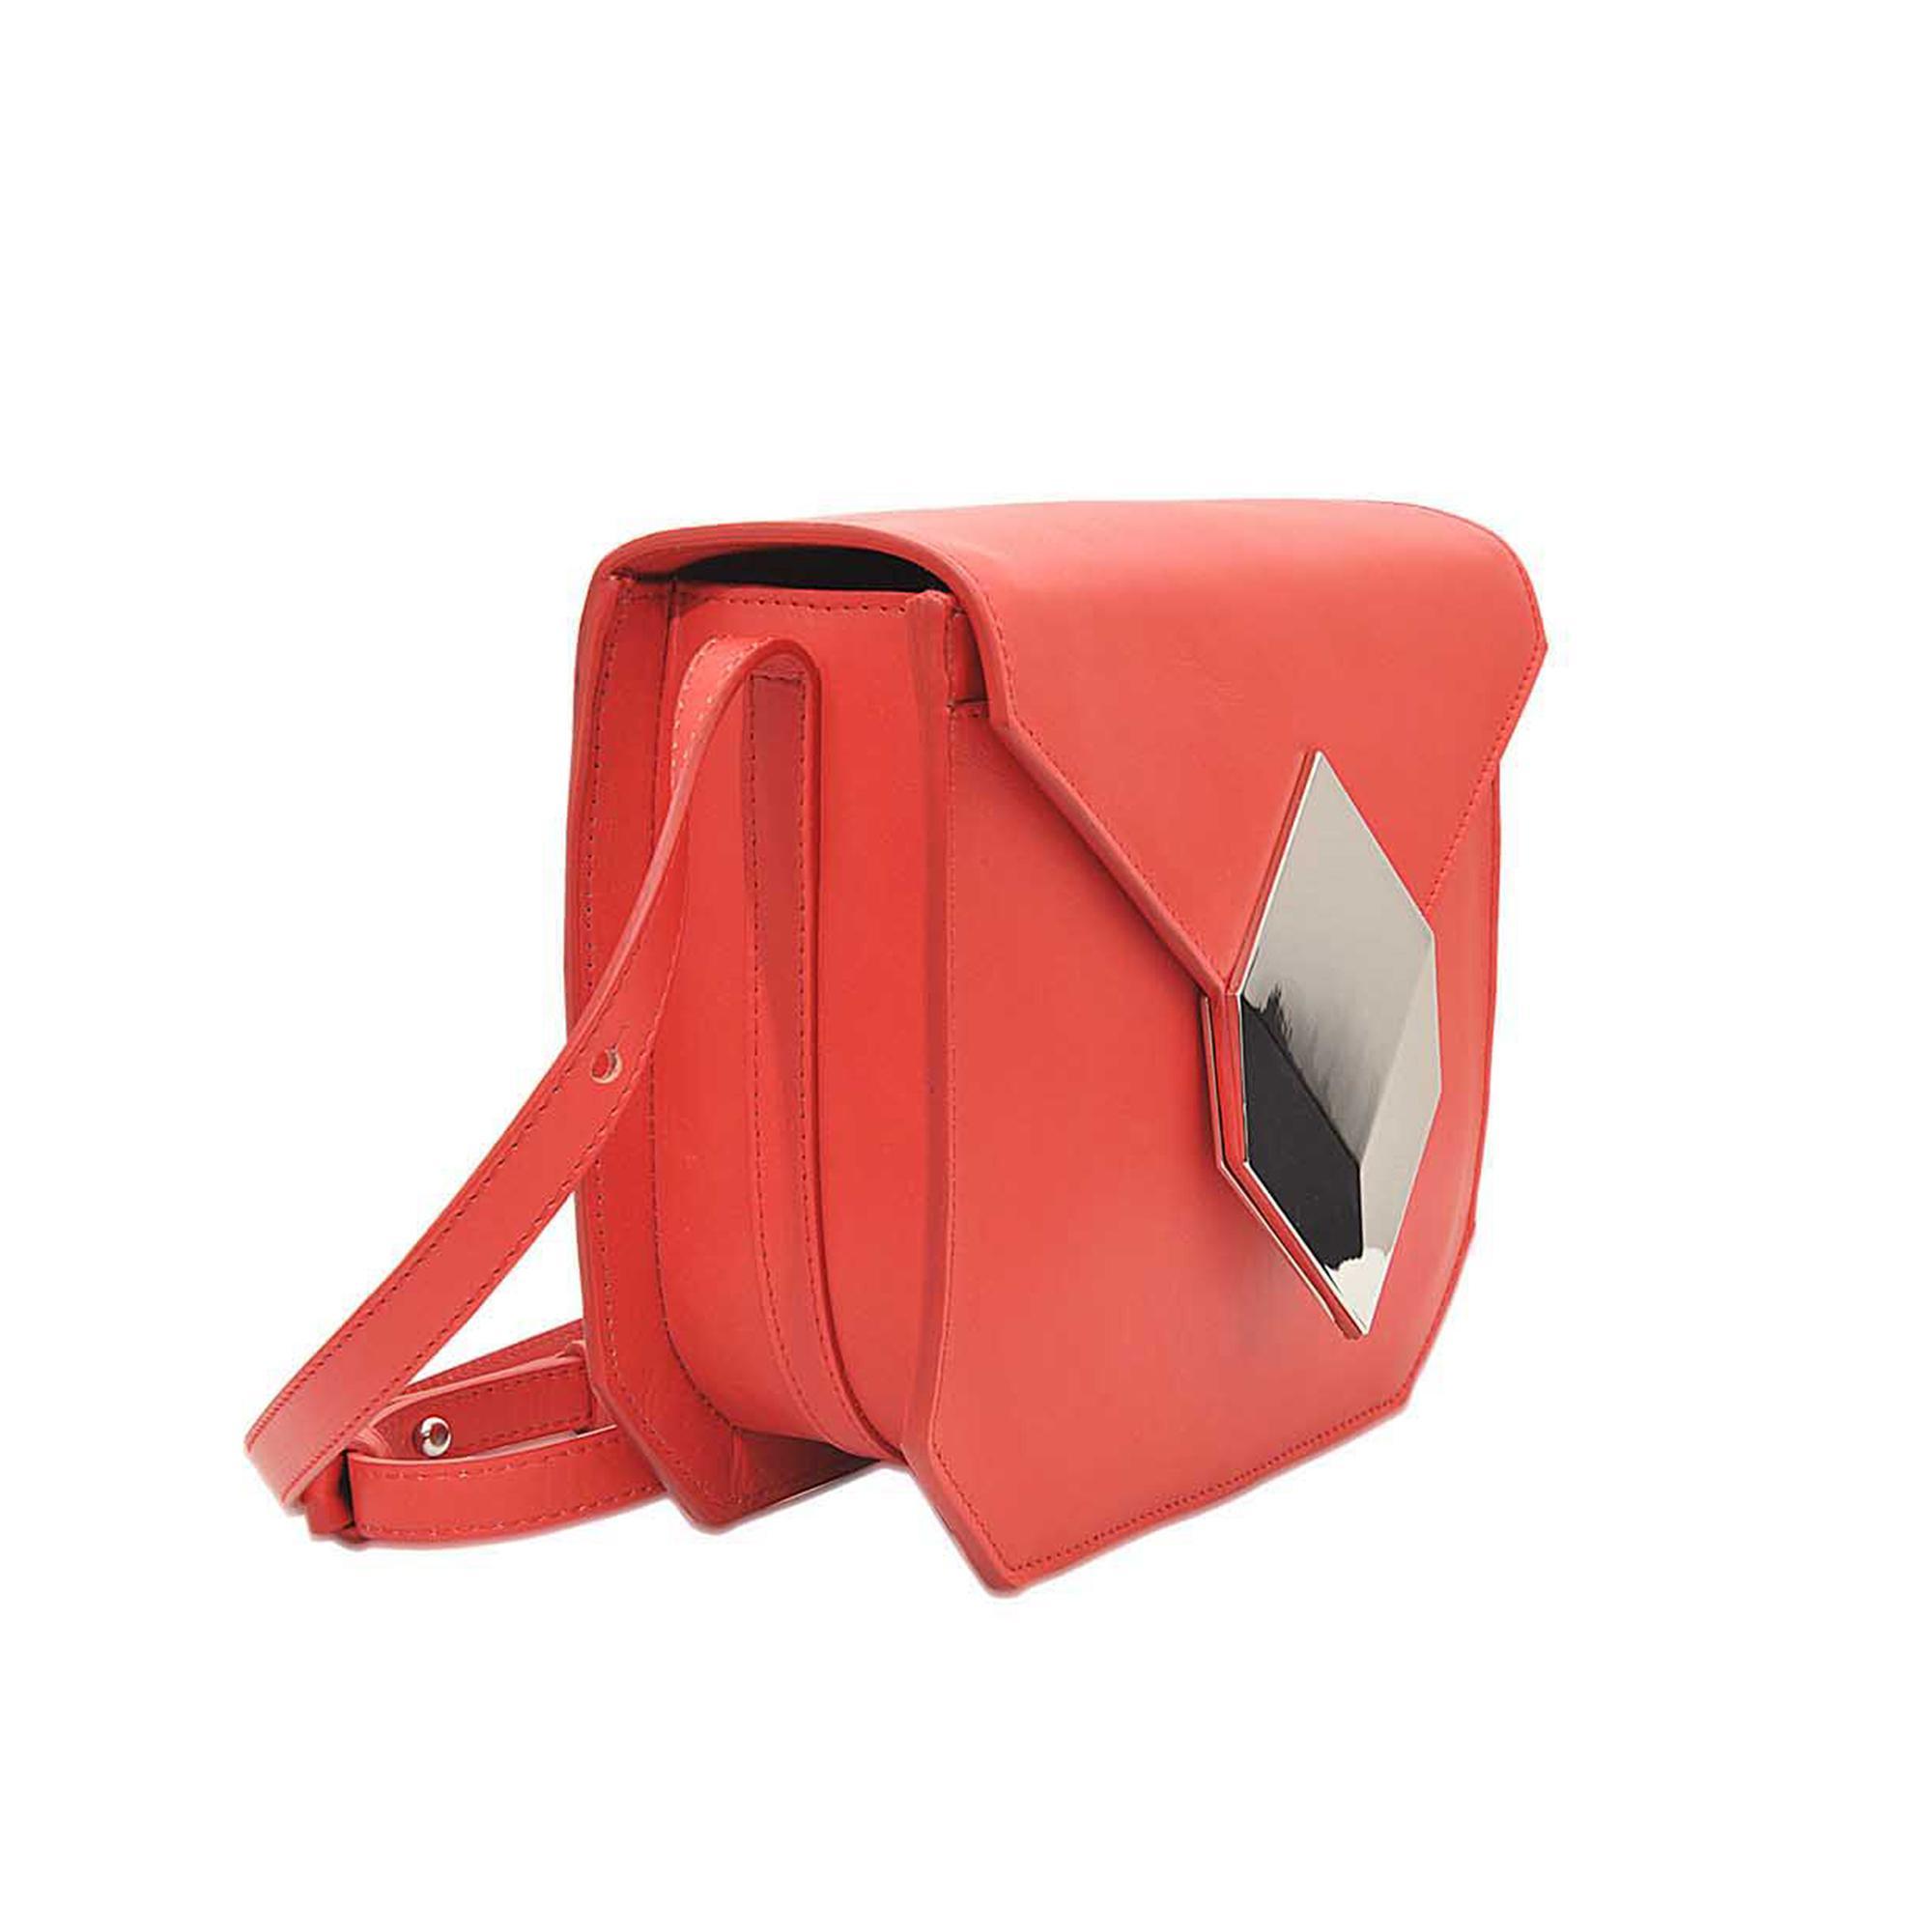 Pierre Hardy Prism Crossbody Bag in Orange